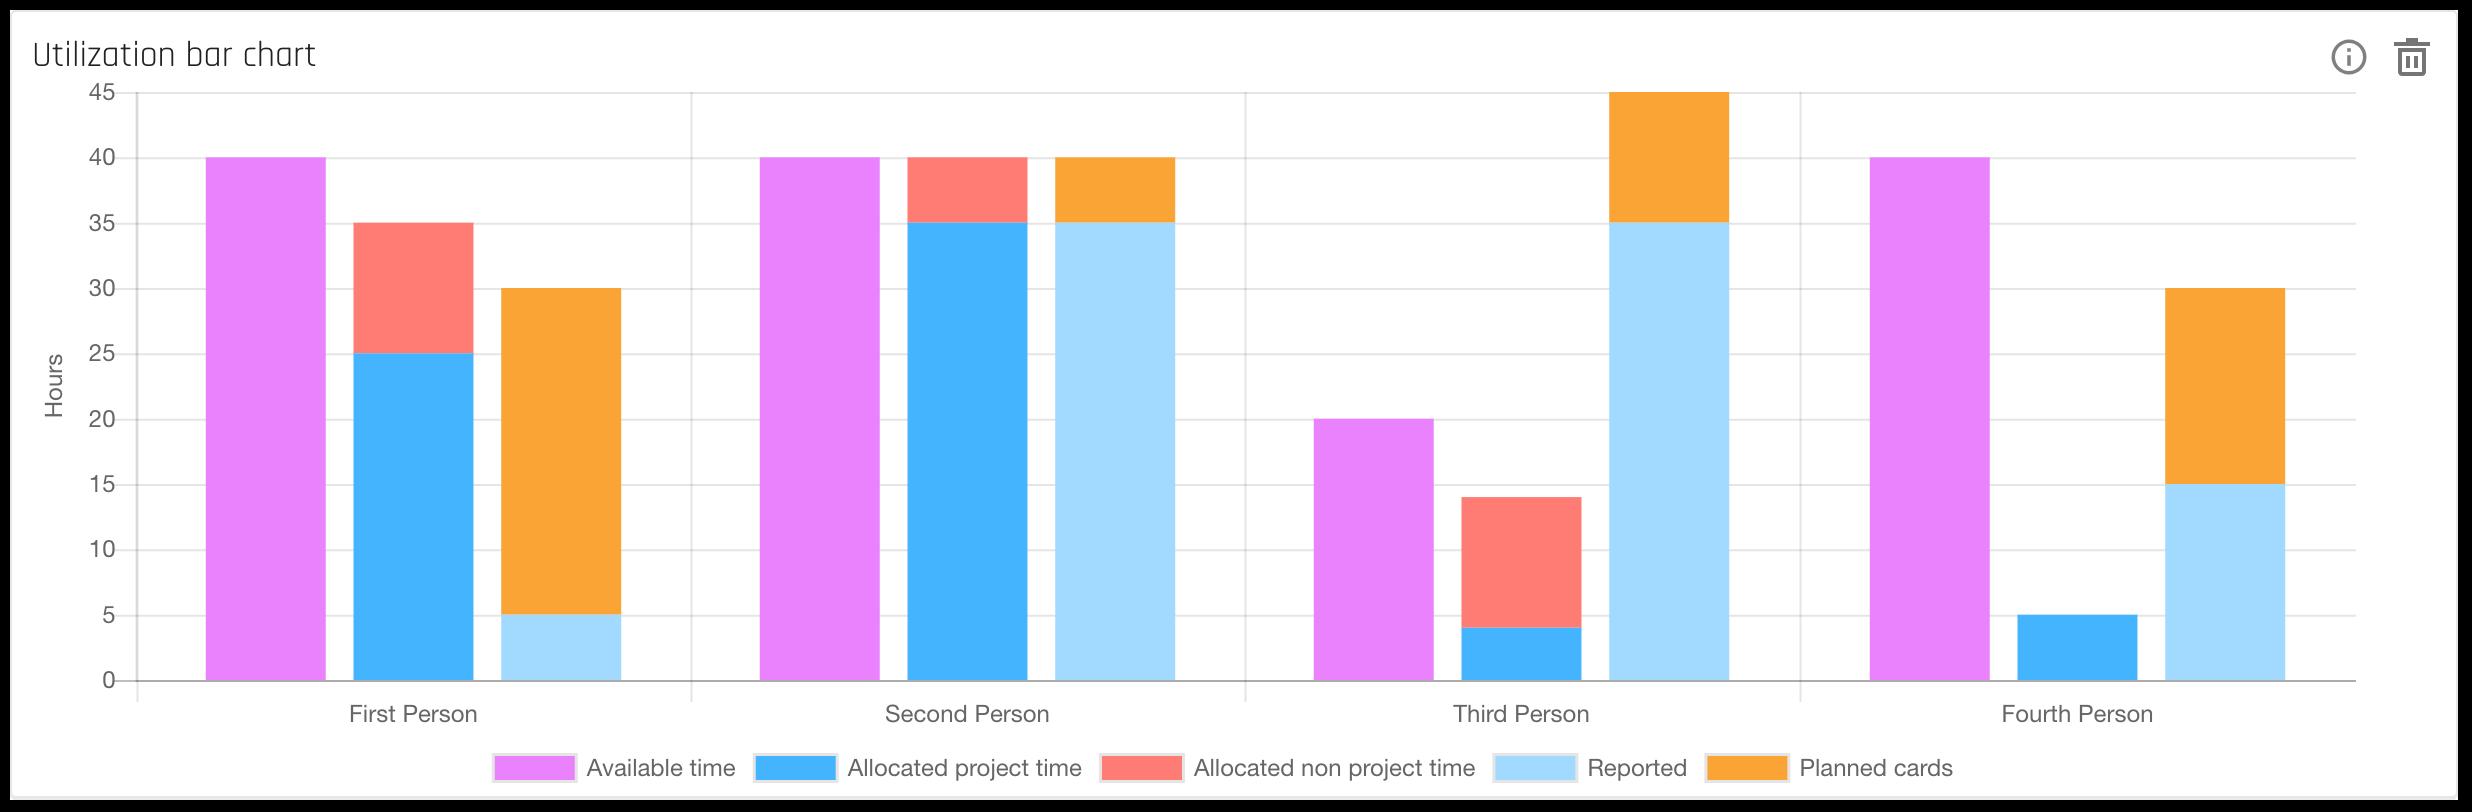 forecast_insights-portfolio-utilizationbarchart